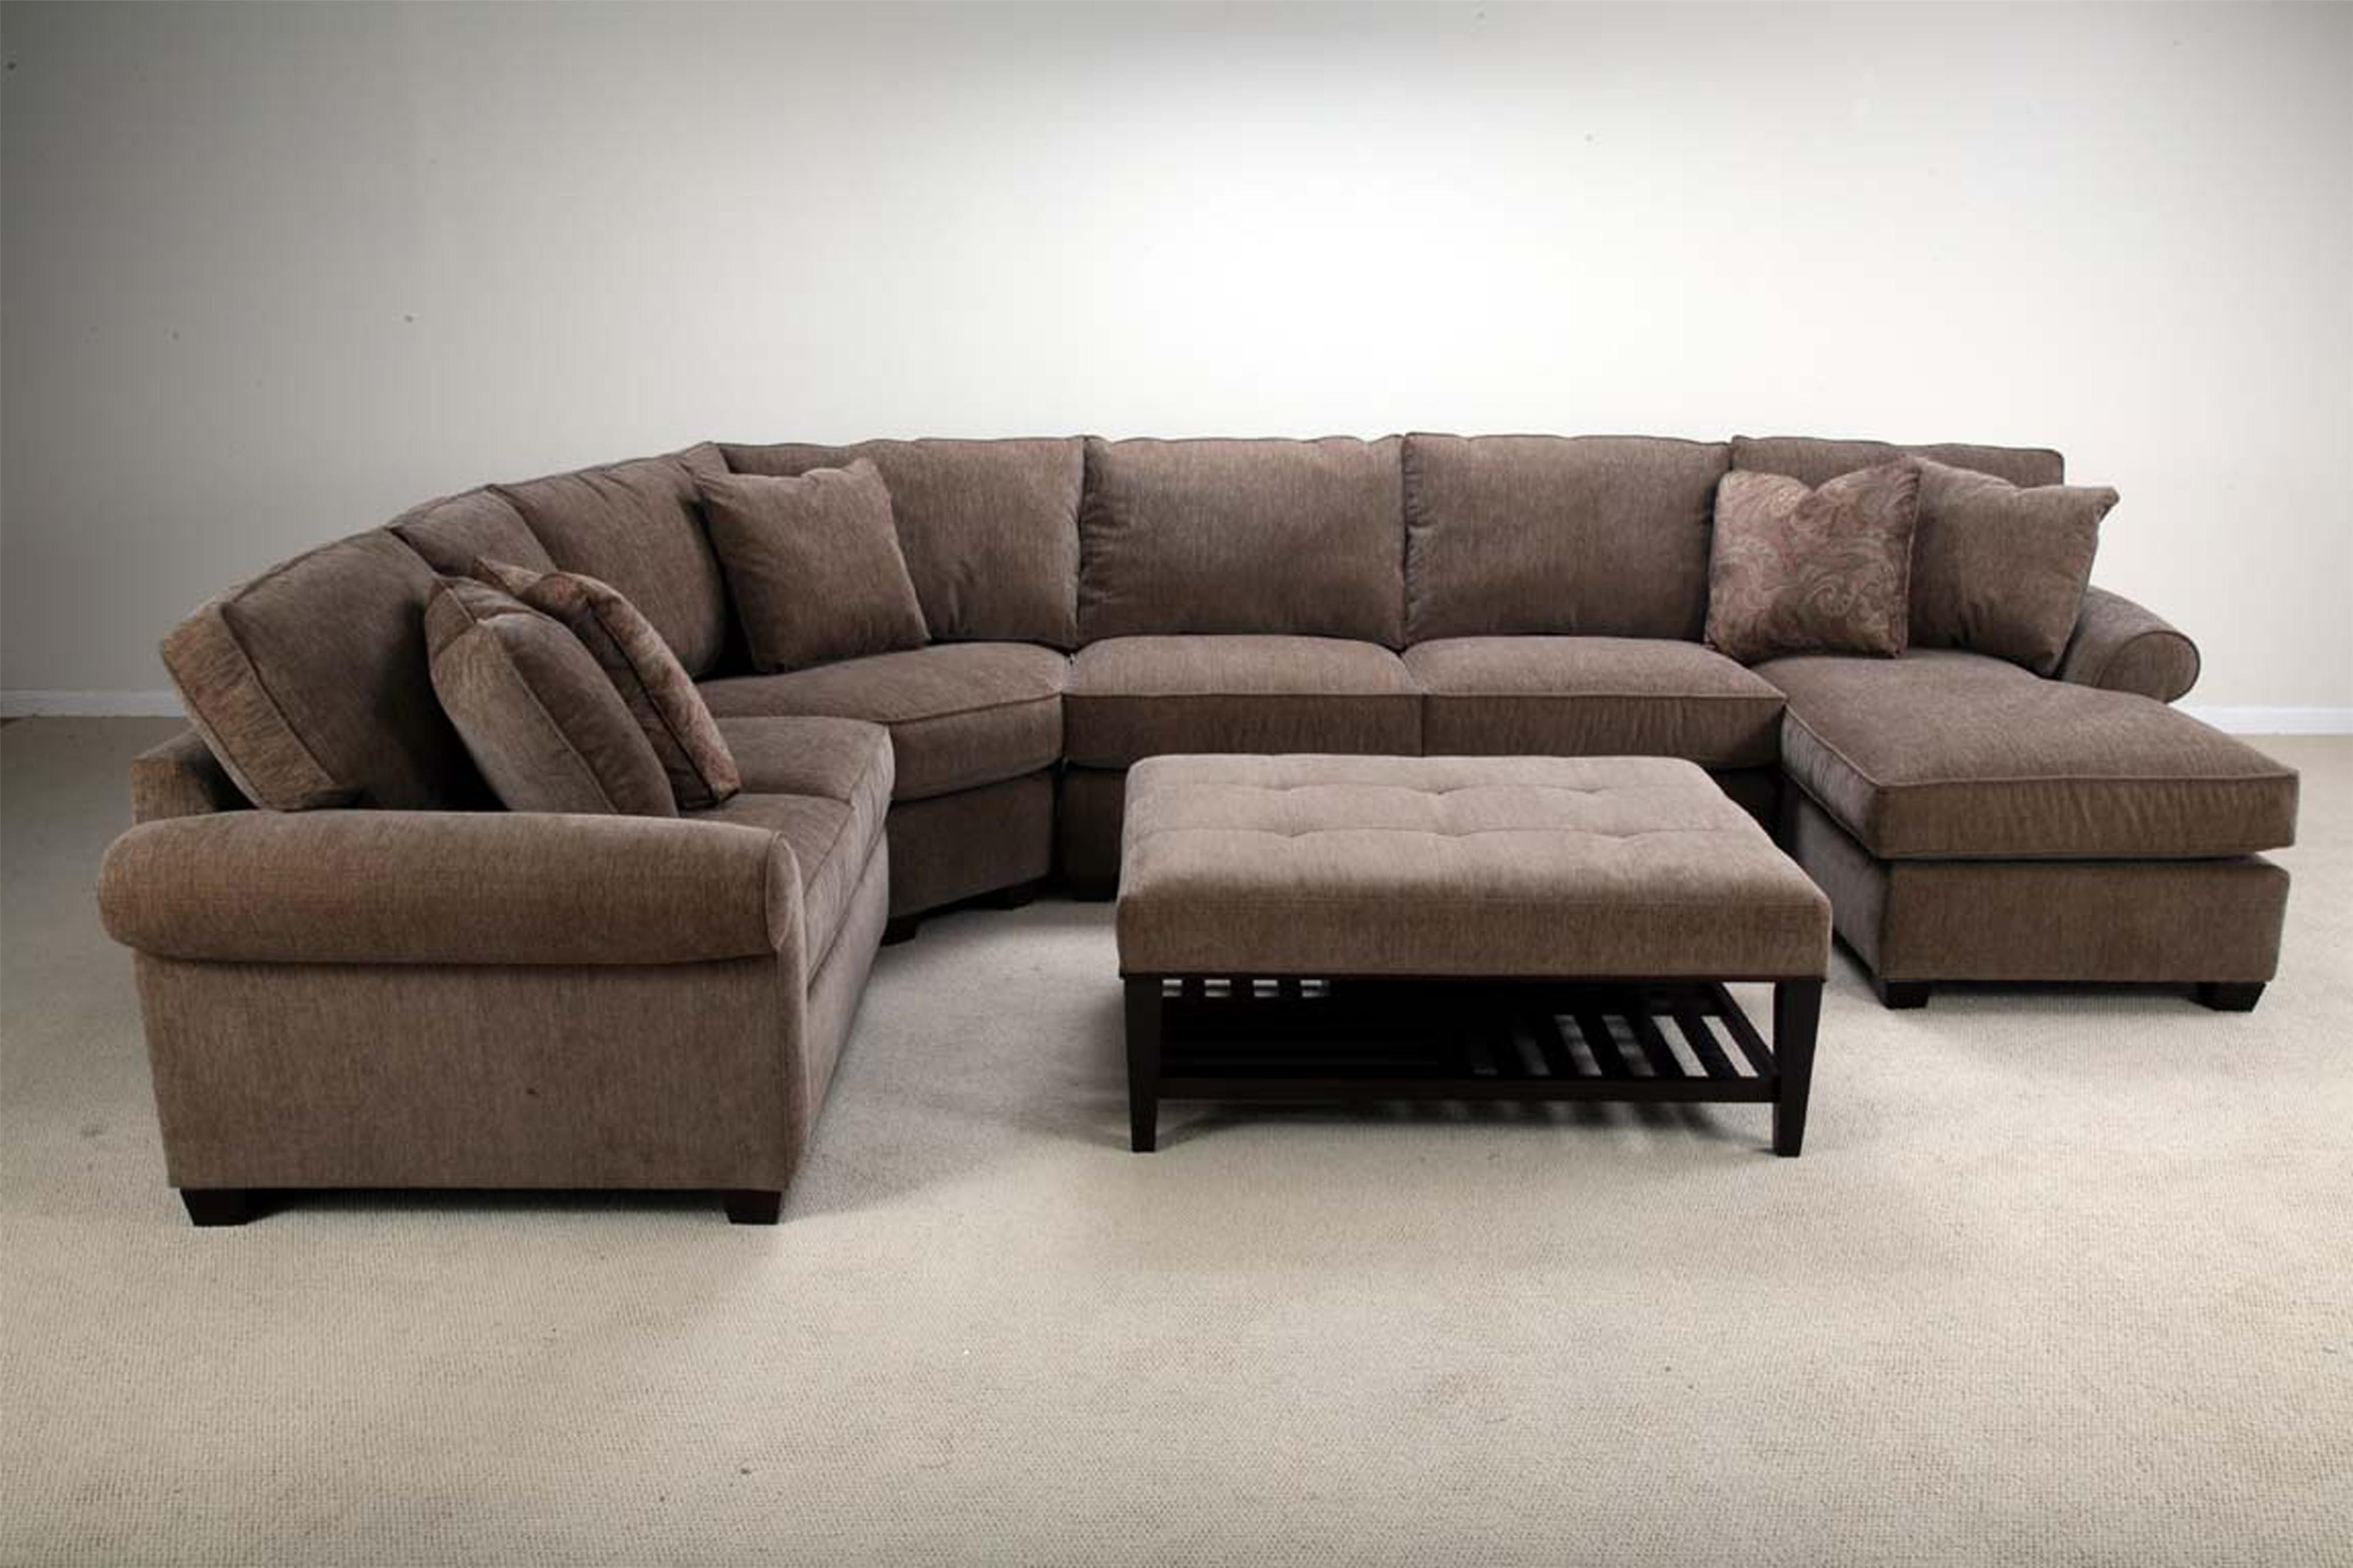 15 Bauhaus Sectional Sofas